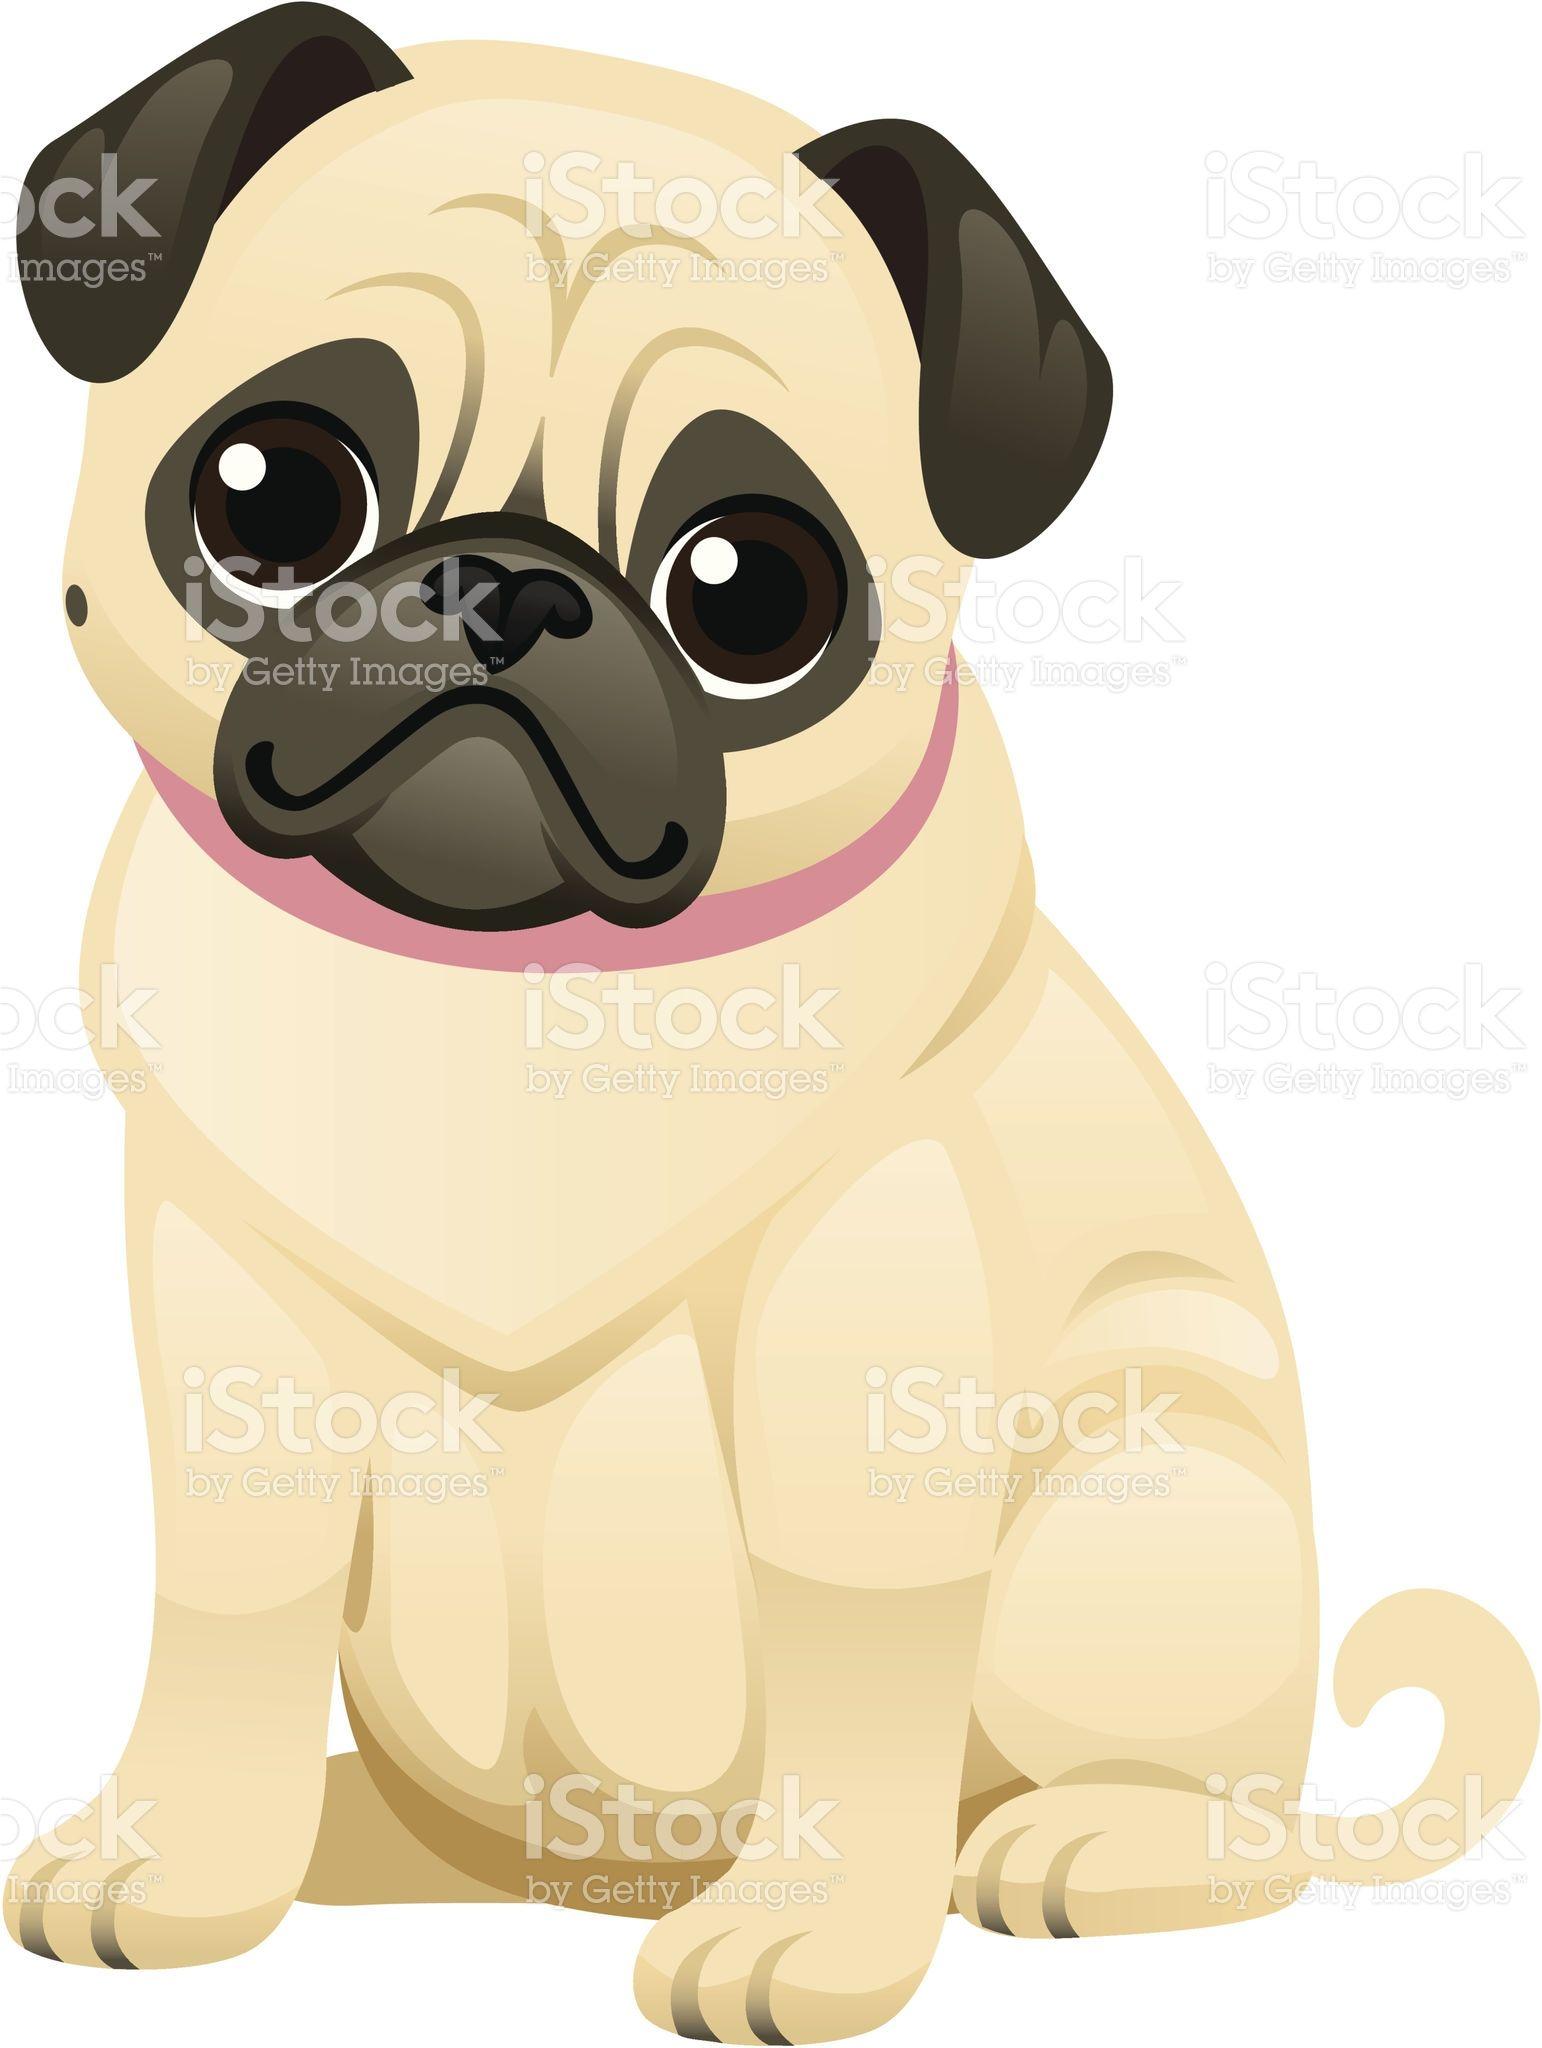 A Sweet Little Pug Wearing A Collar The Face Body And Collar Are Pugs Adorables Dibujos De Perros Perros En Caricatura